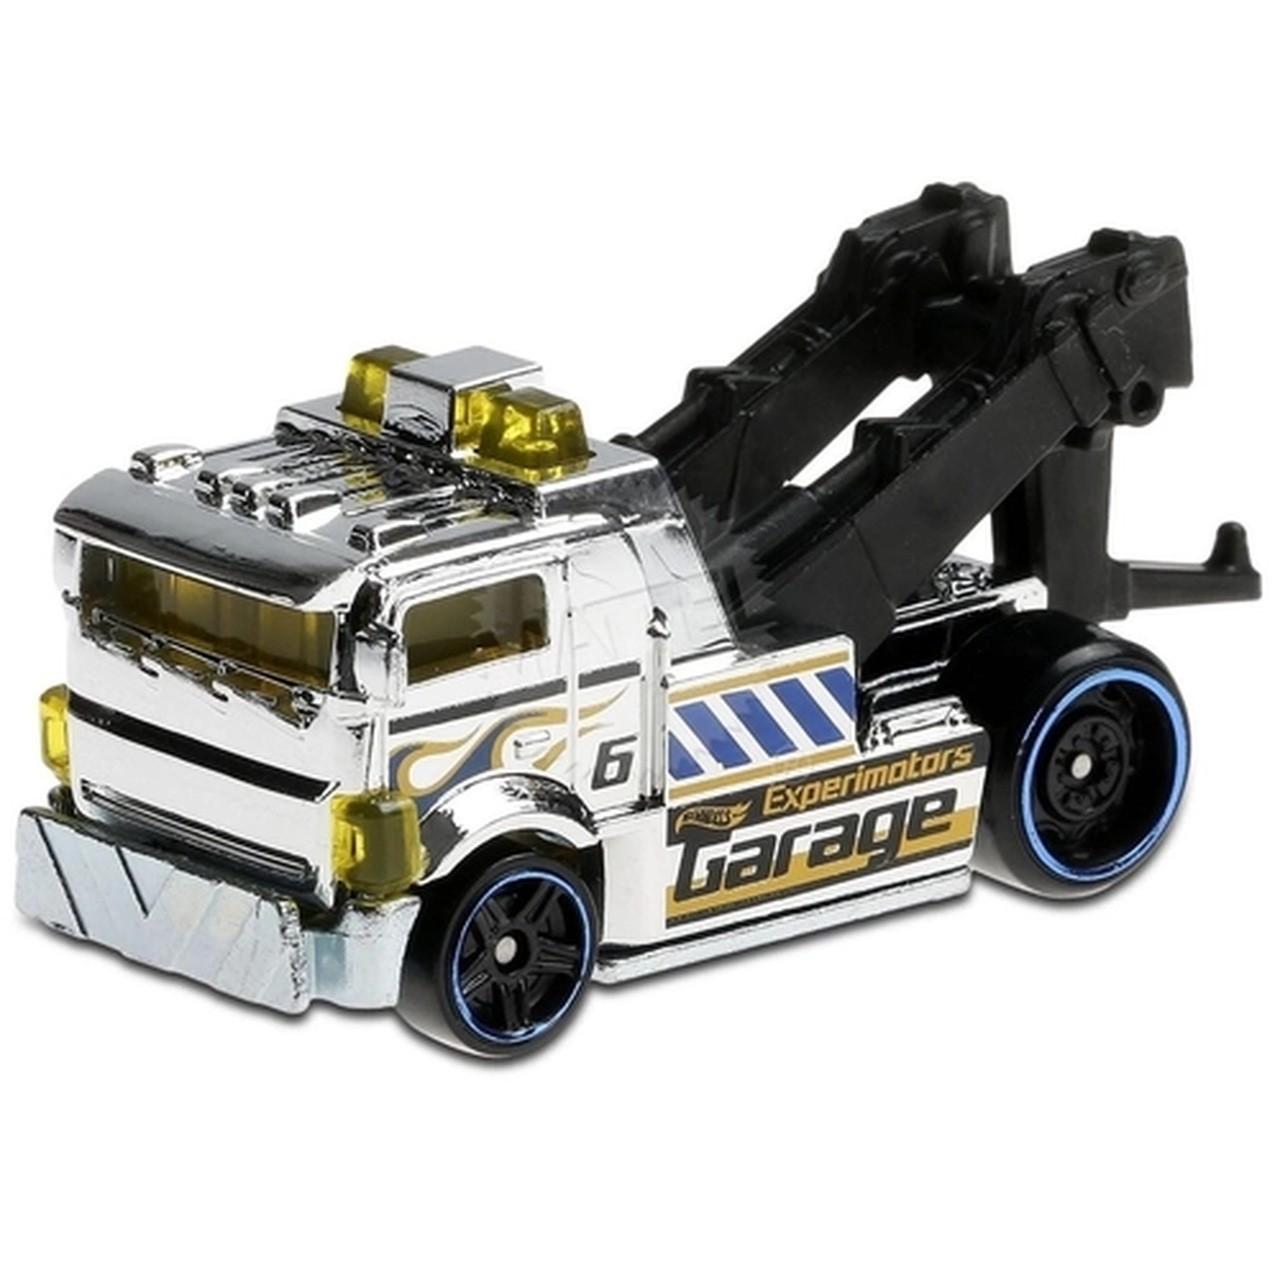 Carrinho Hot Wheels Heavy Hitcher™ (DKXWR) Experimotors